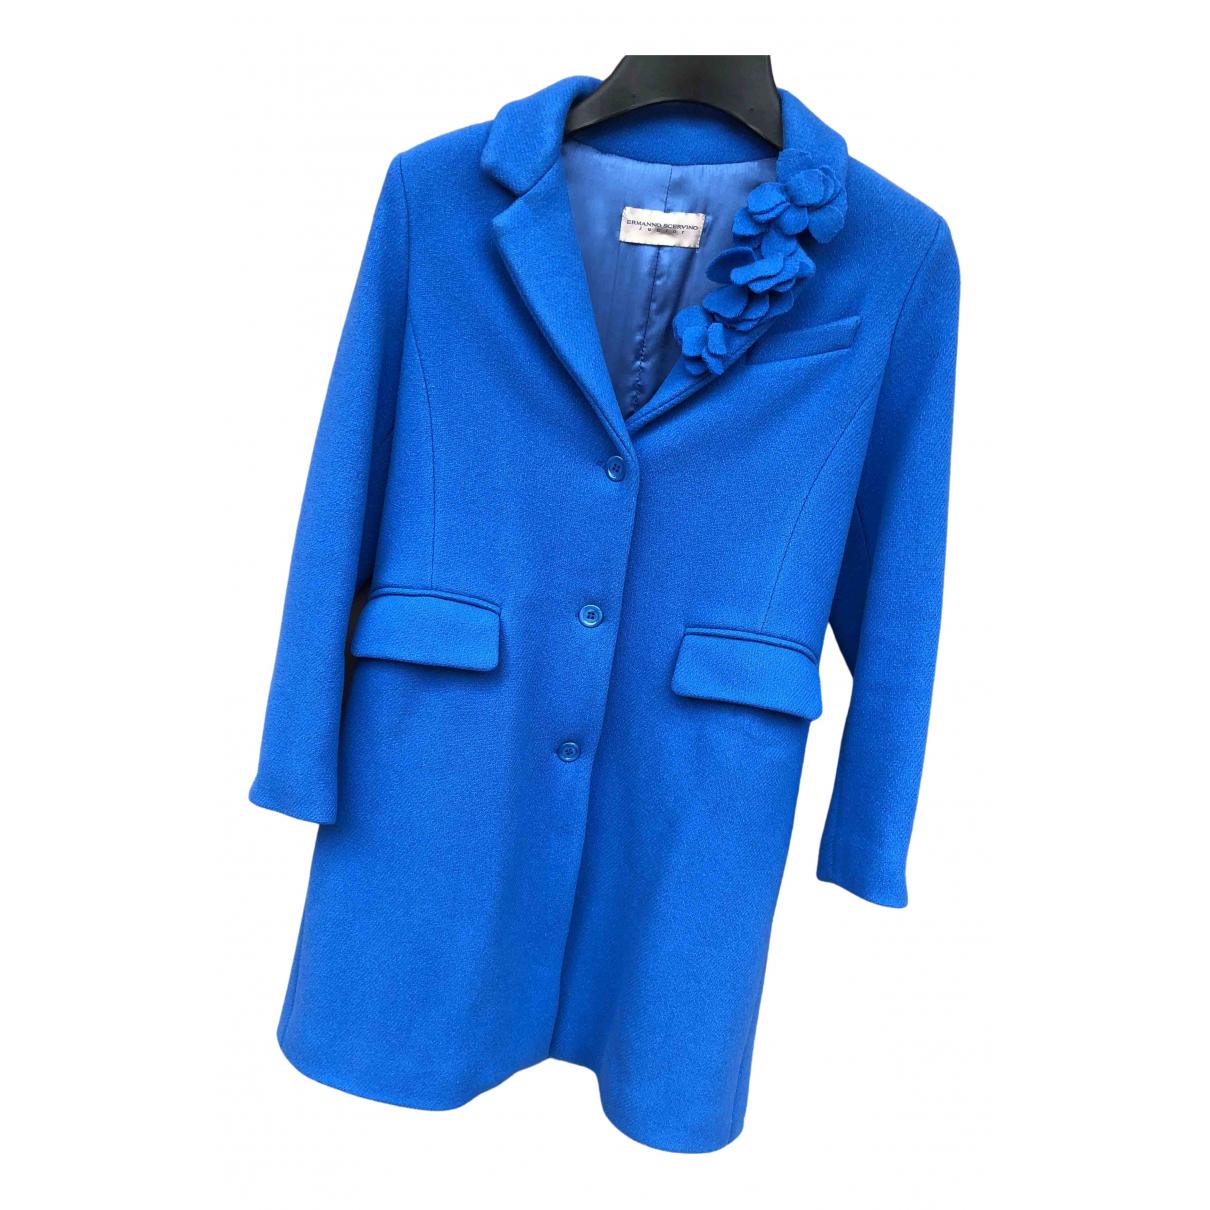 Ermanno Scervino \N Jacke, Maentel in  Blau Wolle